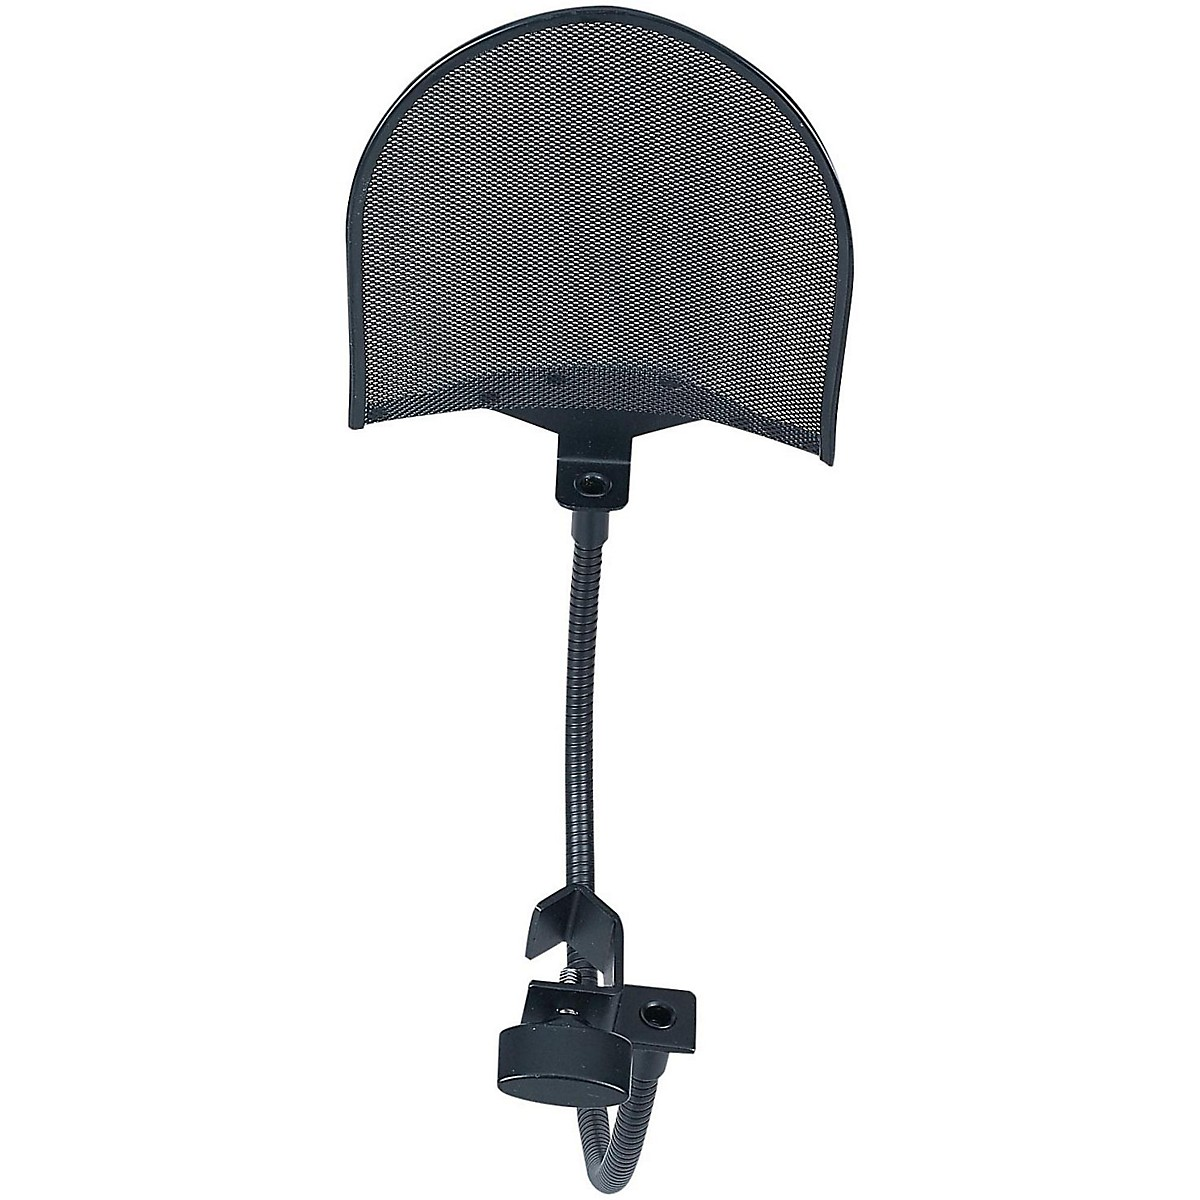 Avantone PS-1 Pro-Shield Studio Pop Filter